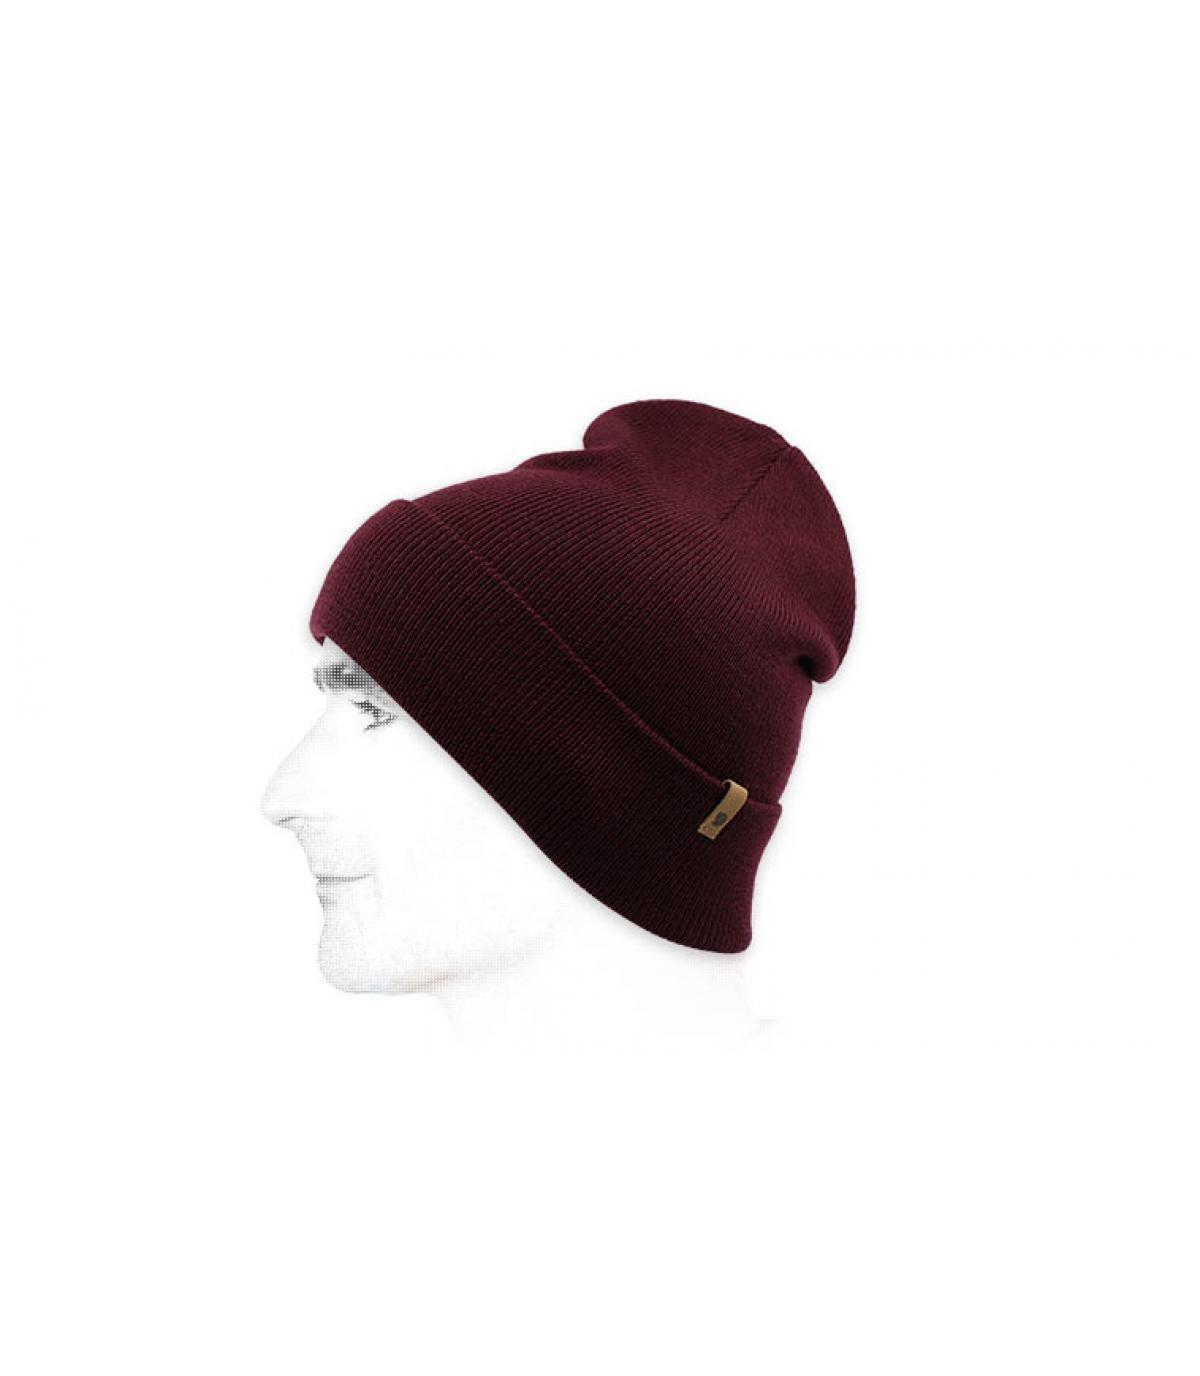 berretto di lana Fjällräven bordeaux